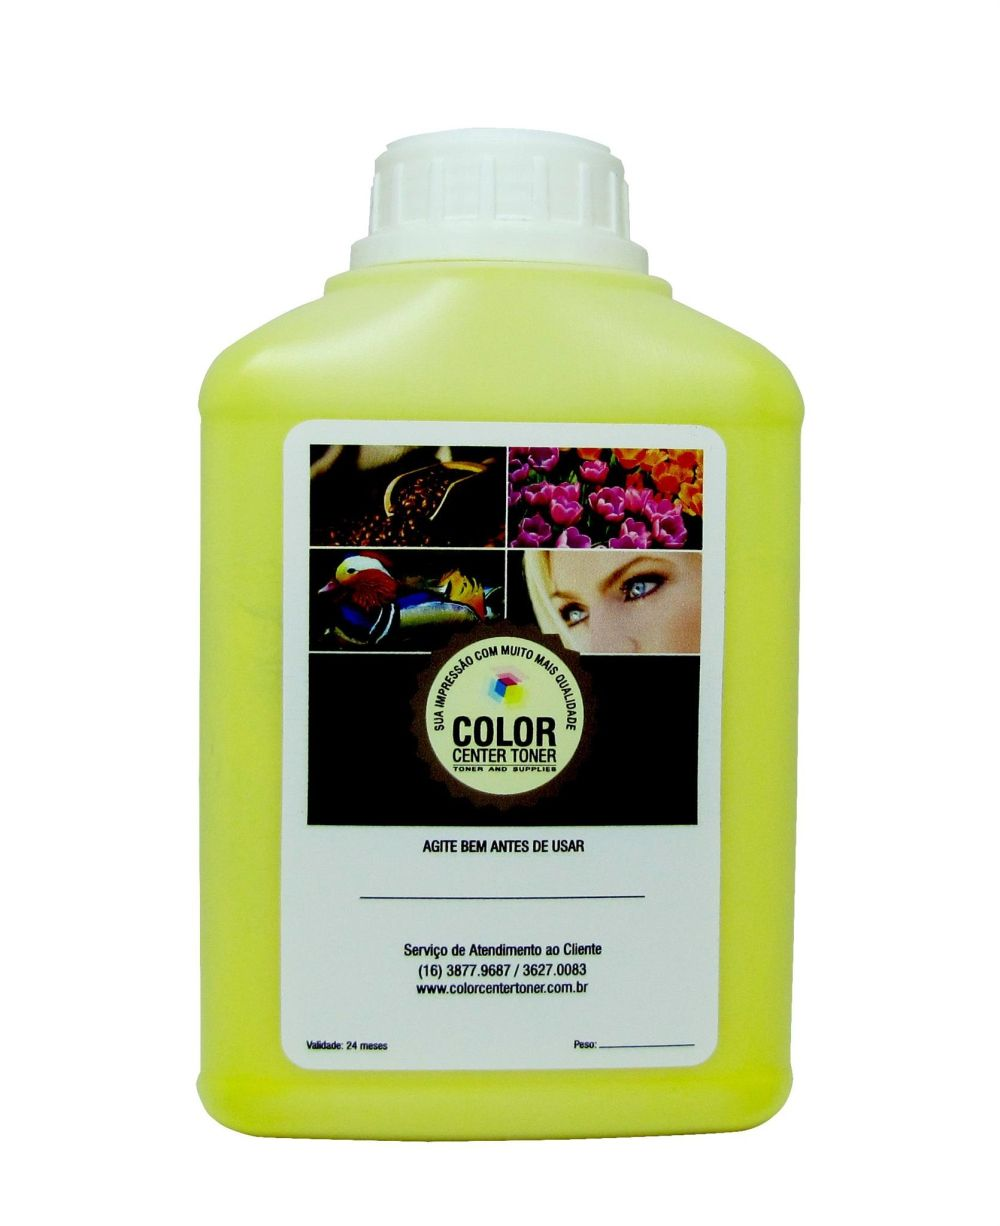 Refil de Toner Minolta 4750DN/EN Amarelo